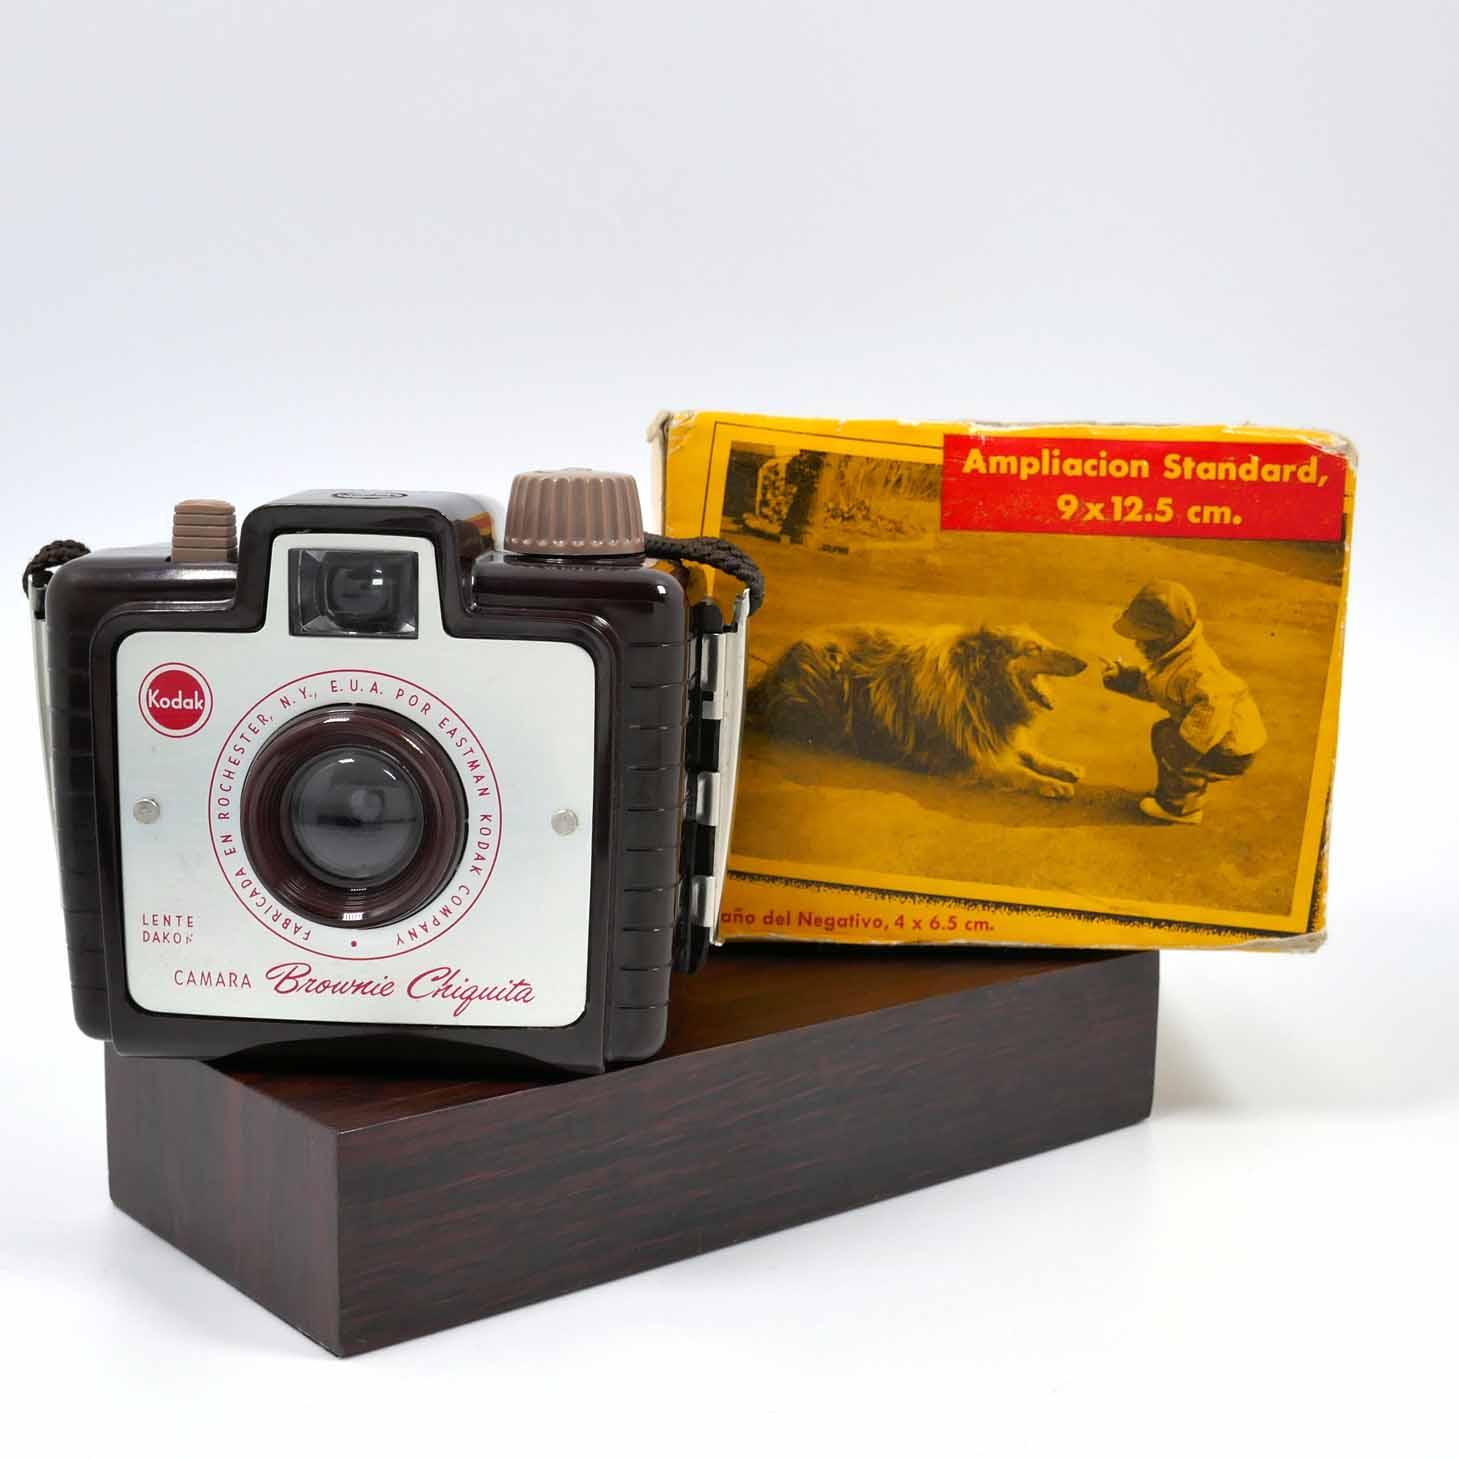 clean-cameras-Kodak-Box-Brownie-Chiquita-06